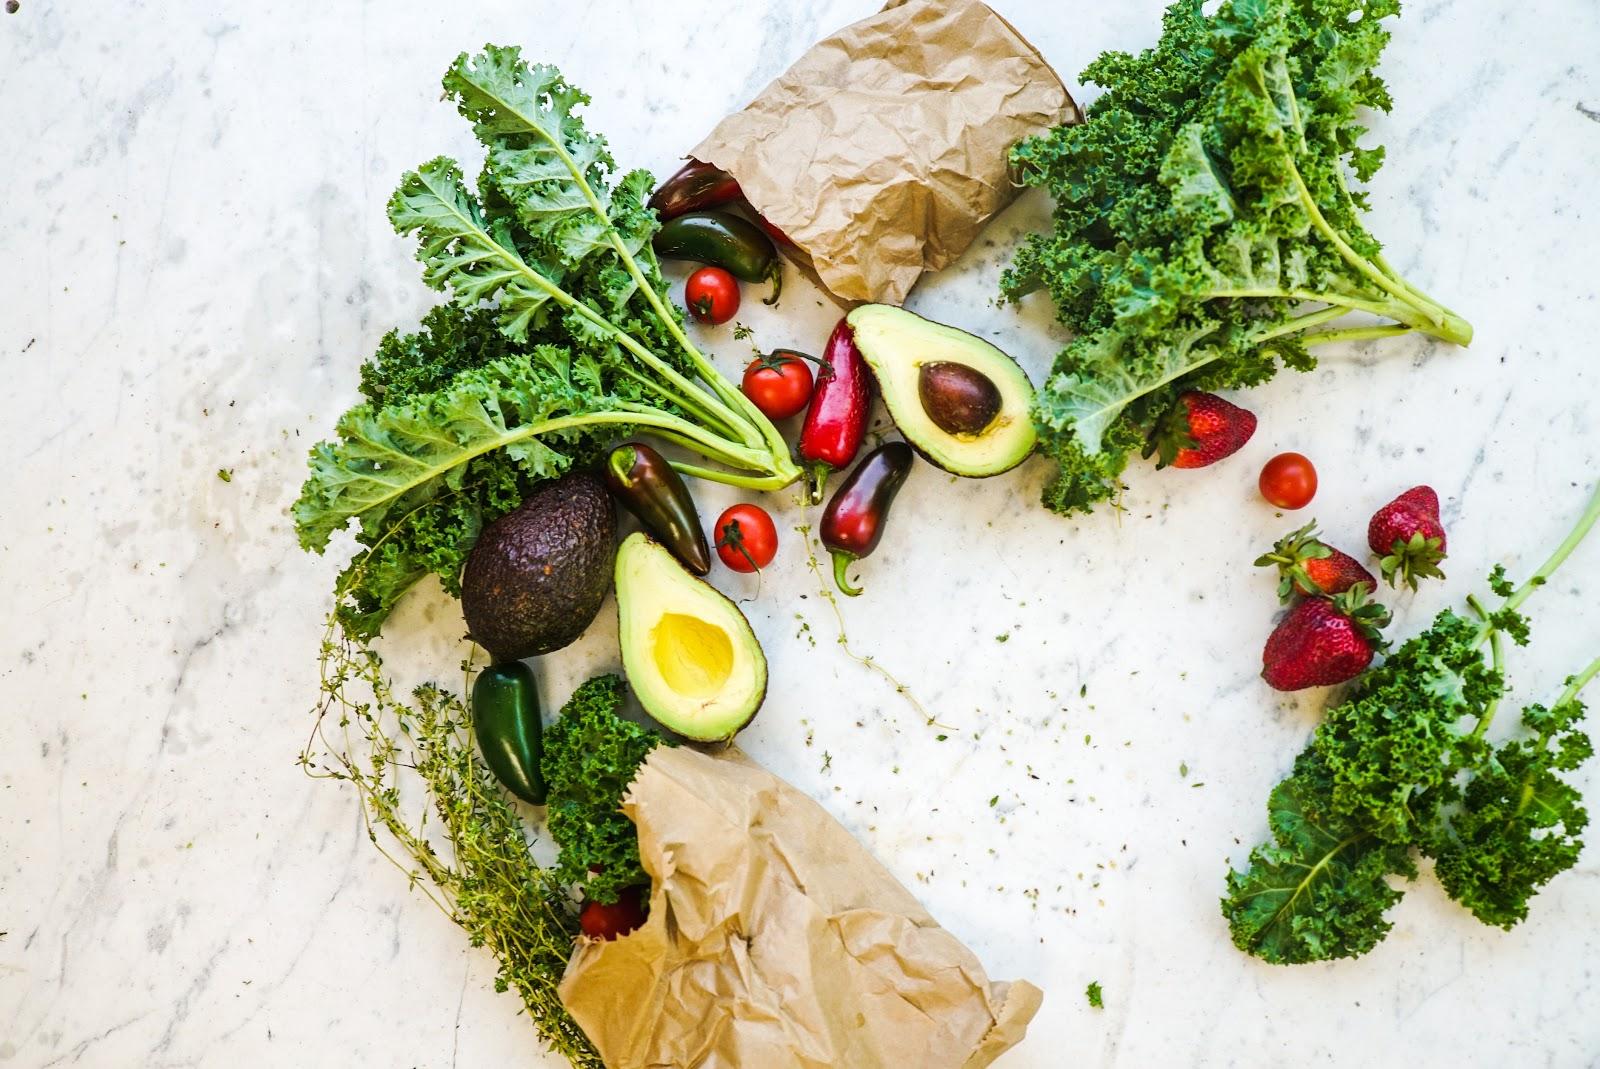 avocado close up eating healthy 1656666 1